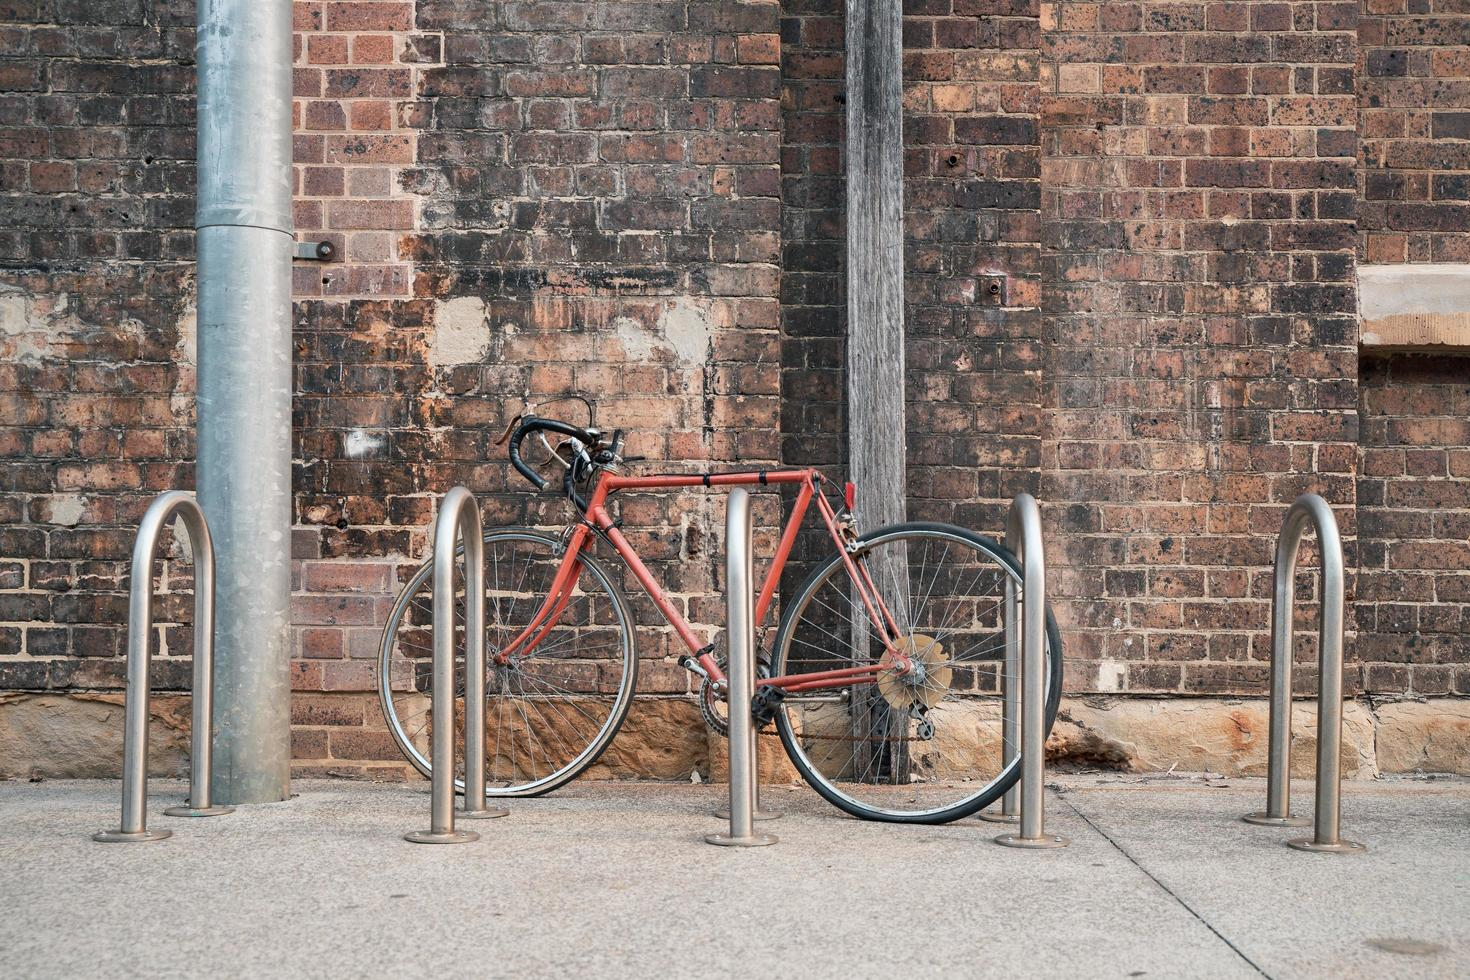 Red bike next to bike rack near wall photo